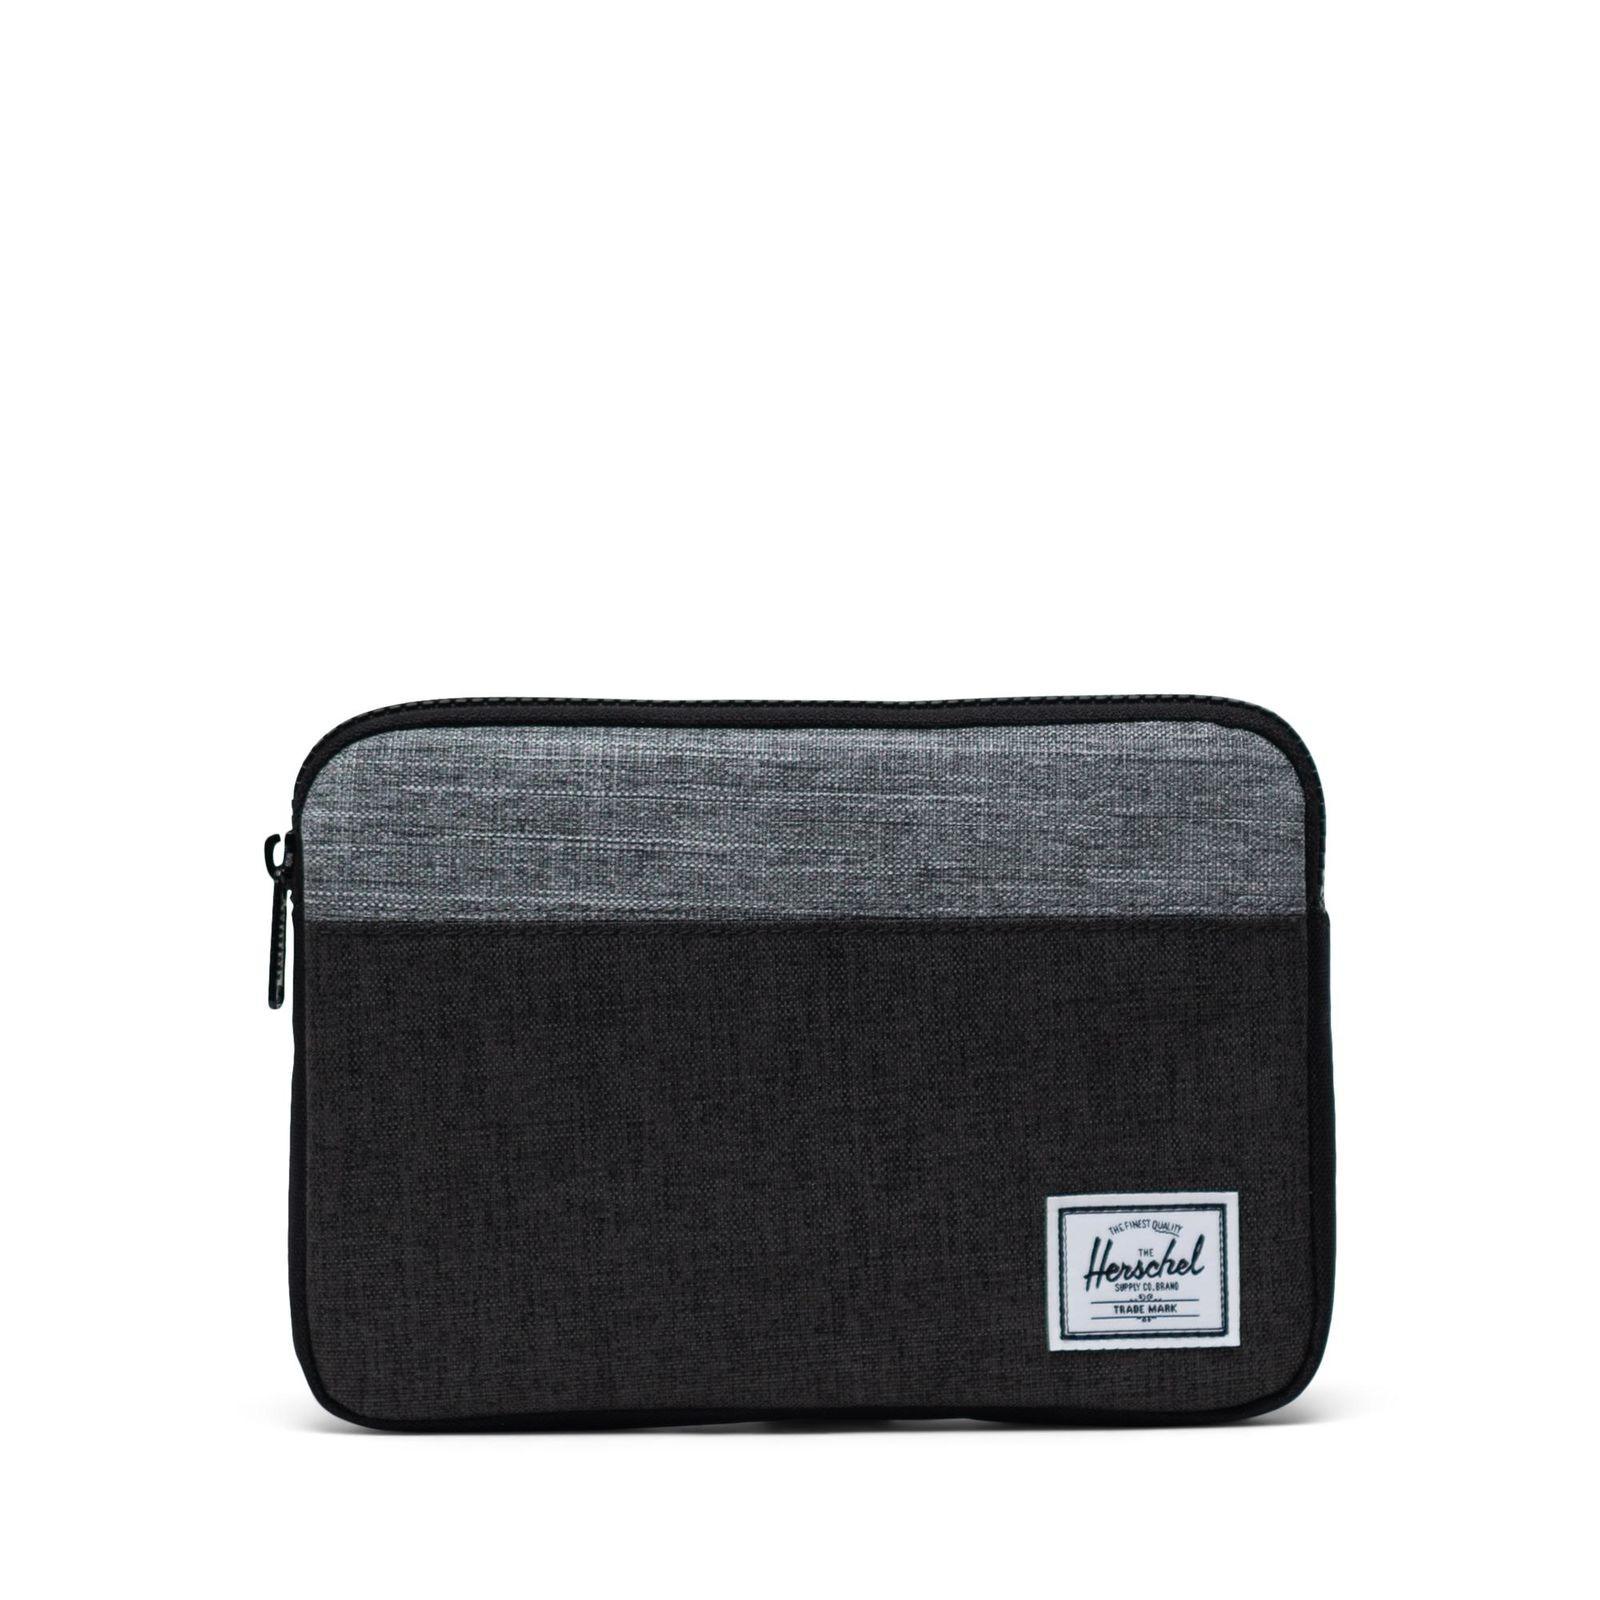 Herschel iPad Kılıfı Anchor Sleeve for iPad MiniBlack Crosshatch/Black/Raven Crosshatch